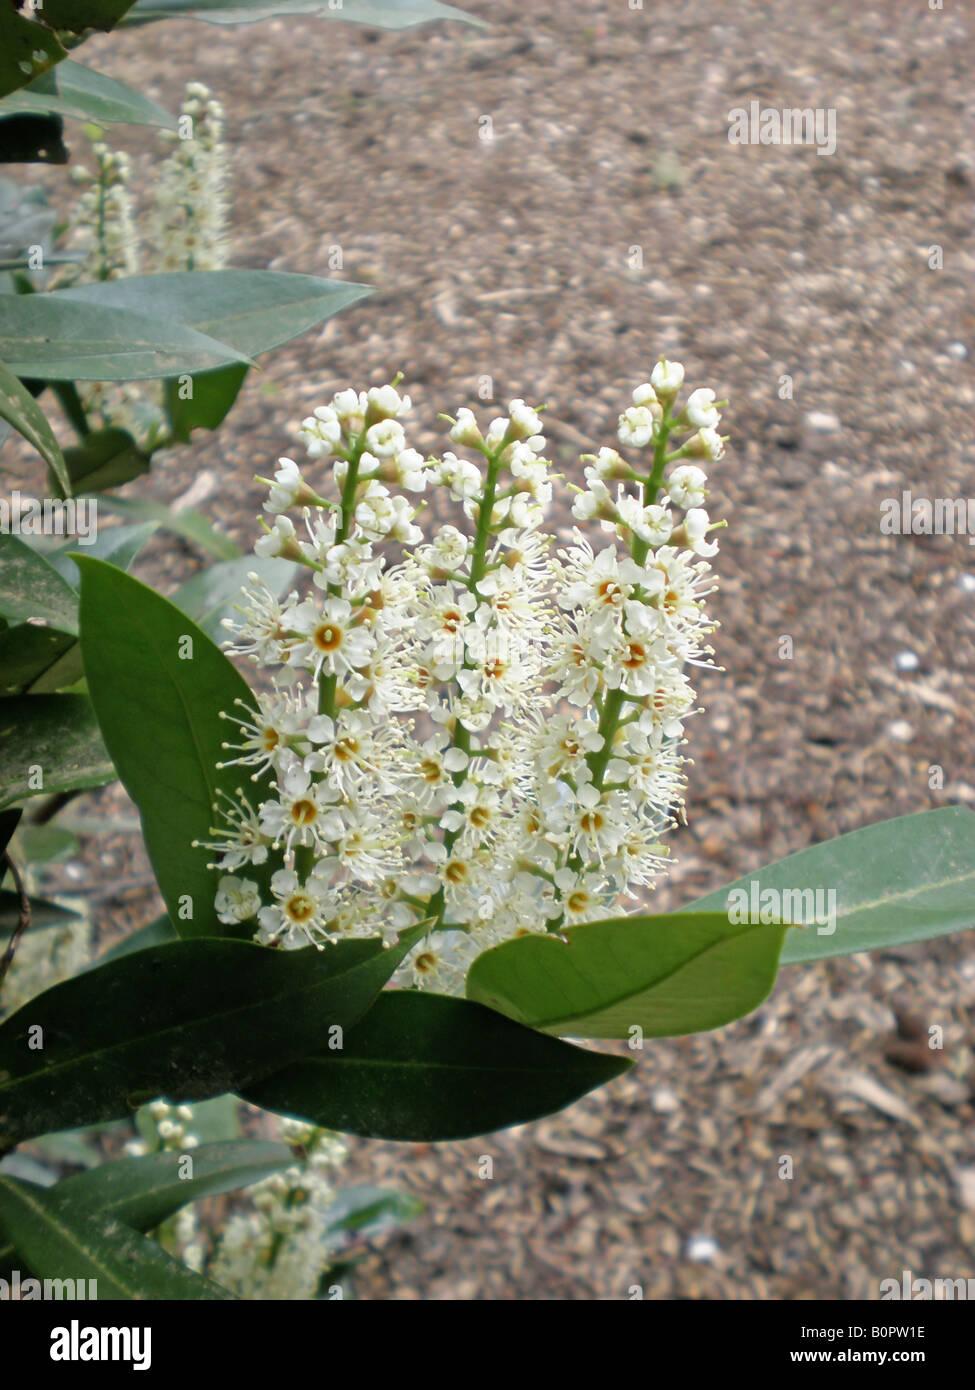 The spring fowers of Otto Lukyen English Laurel Prunus laurocerasus - Stock Image